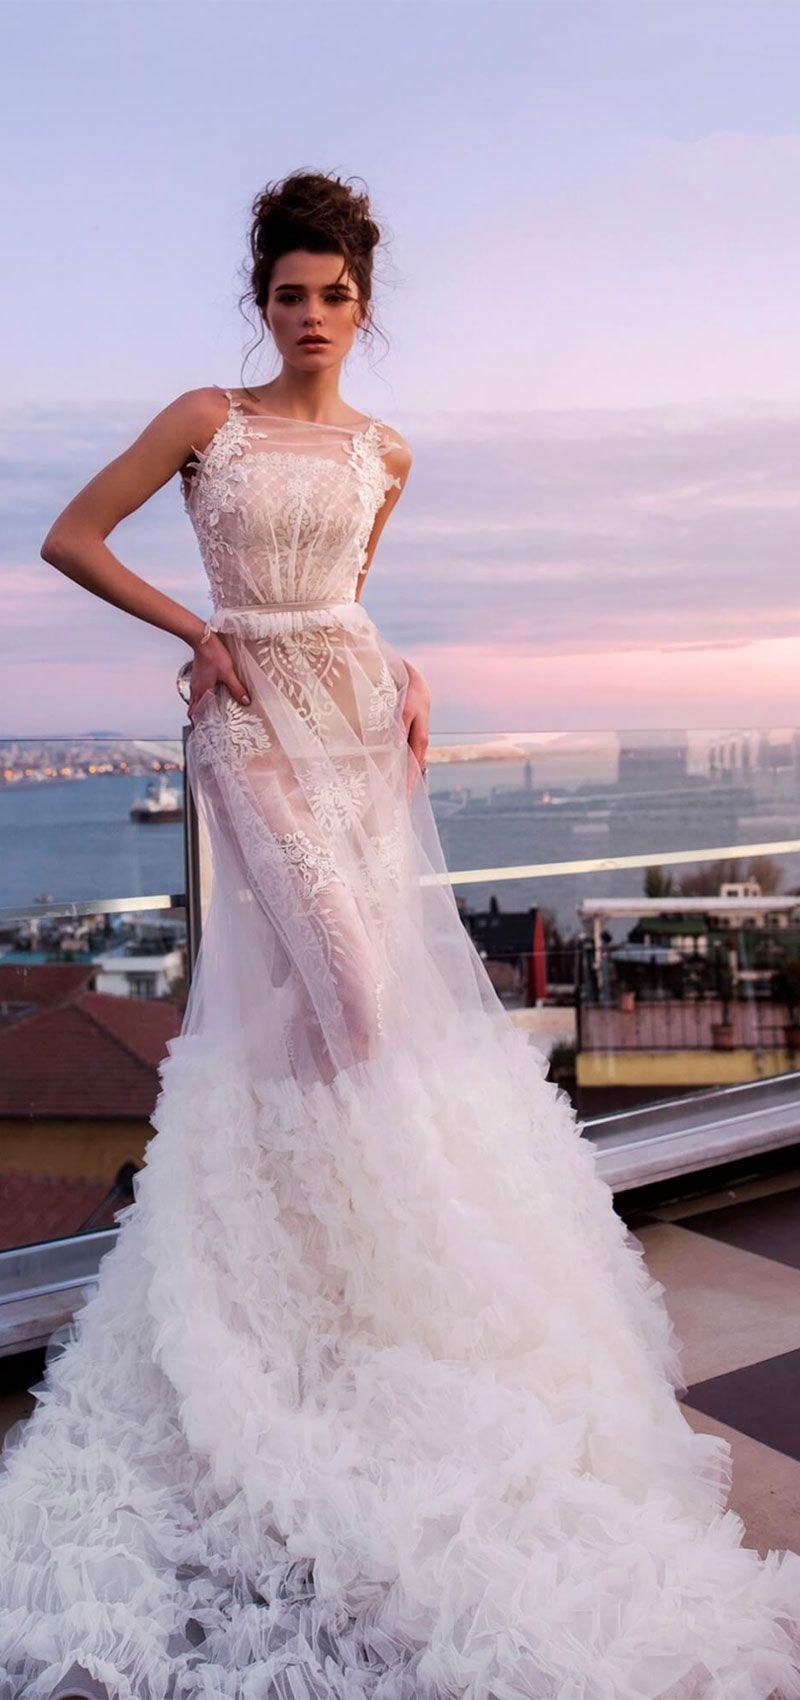 Sleeveless sheath wedding dress tulle ruffled skirt cover #weddingdress #weddinggown #wedding